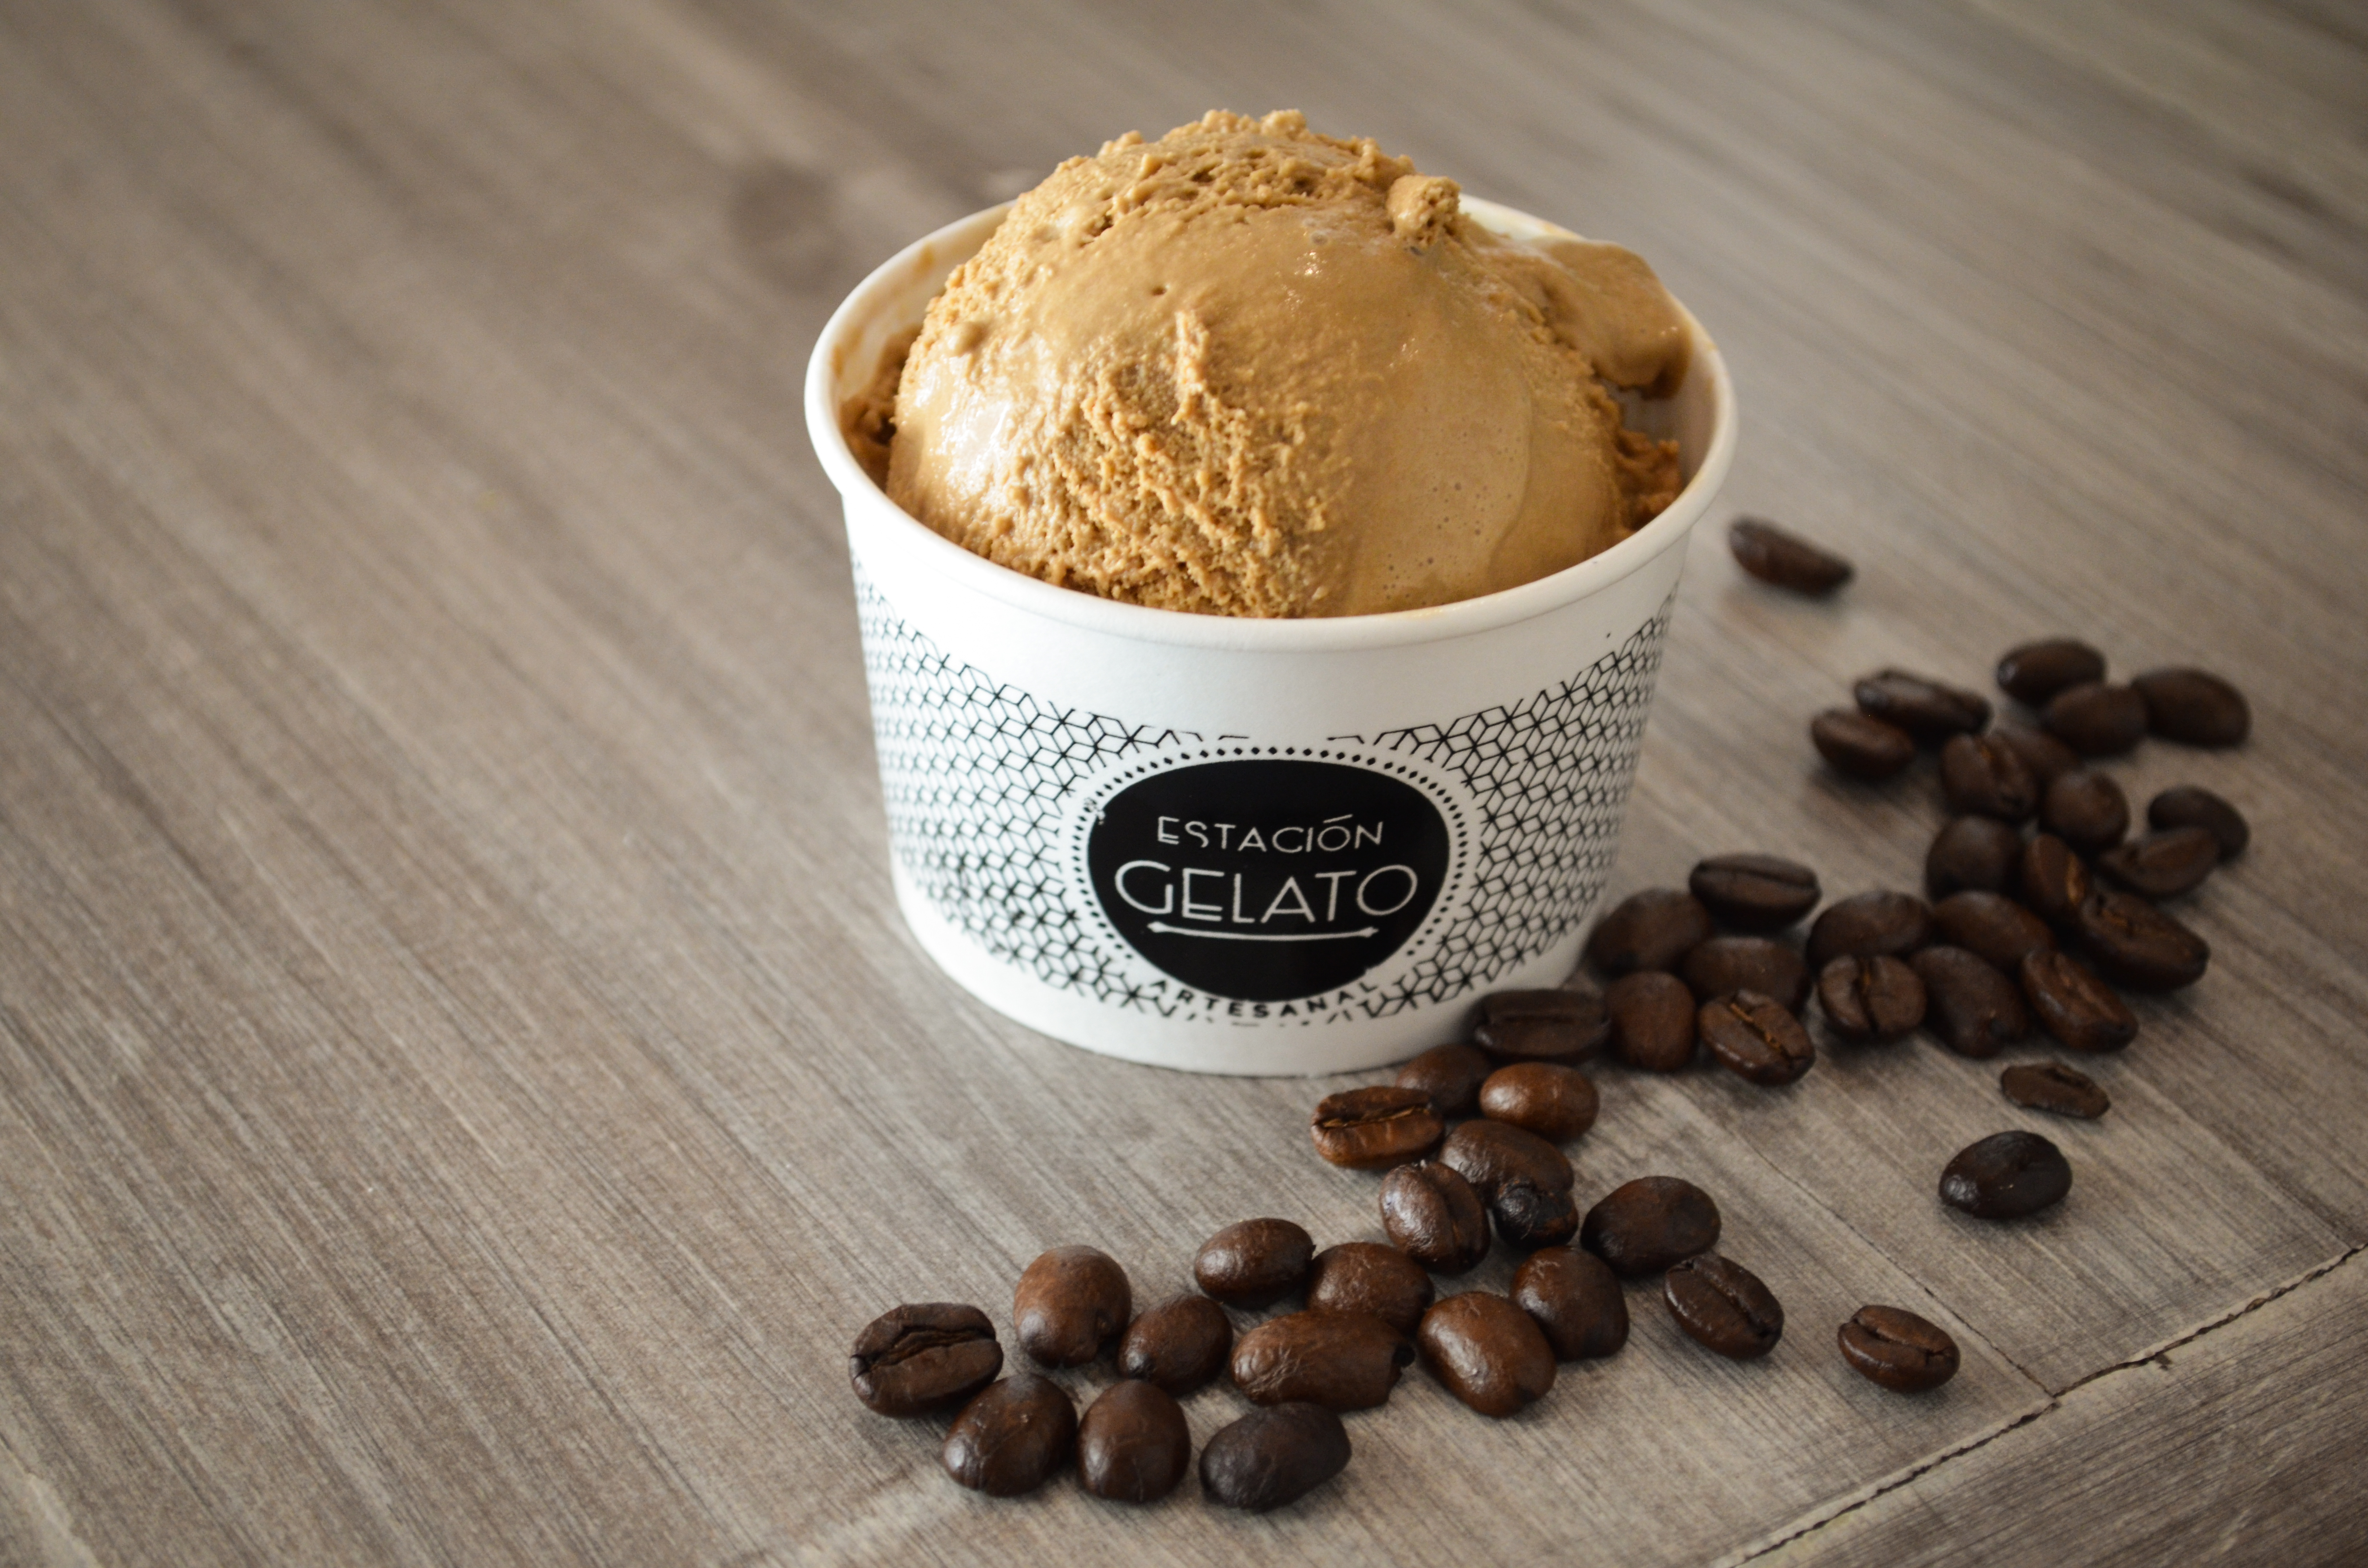 Gelato-Café